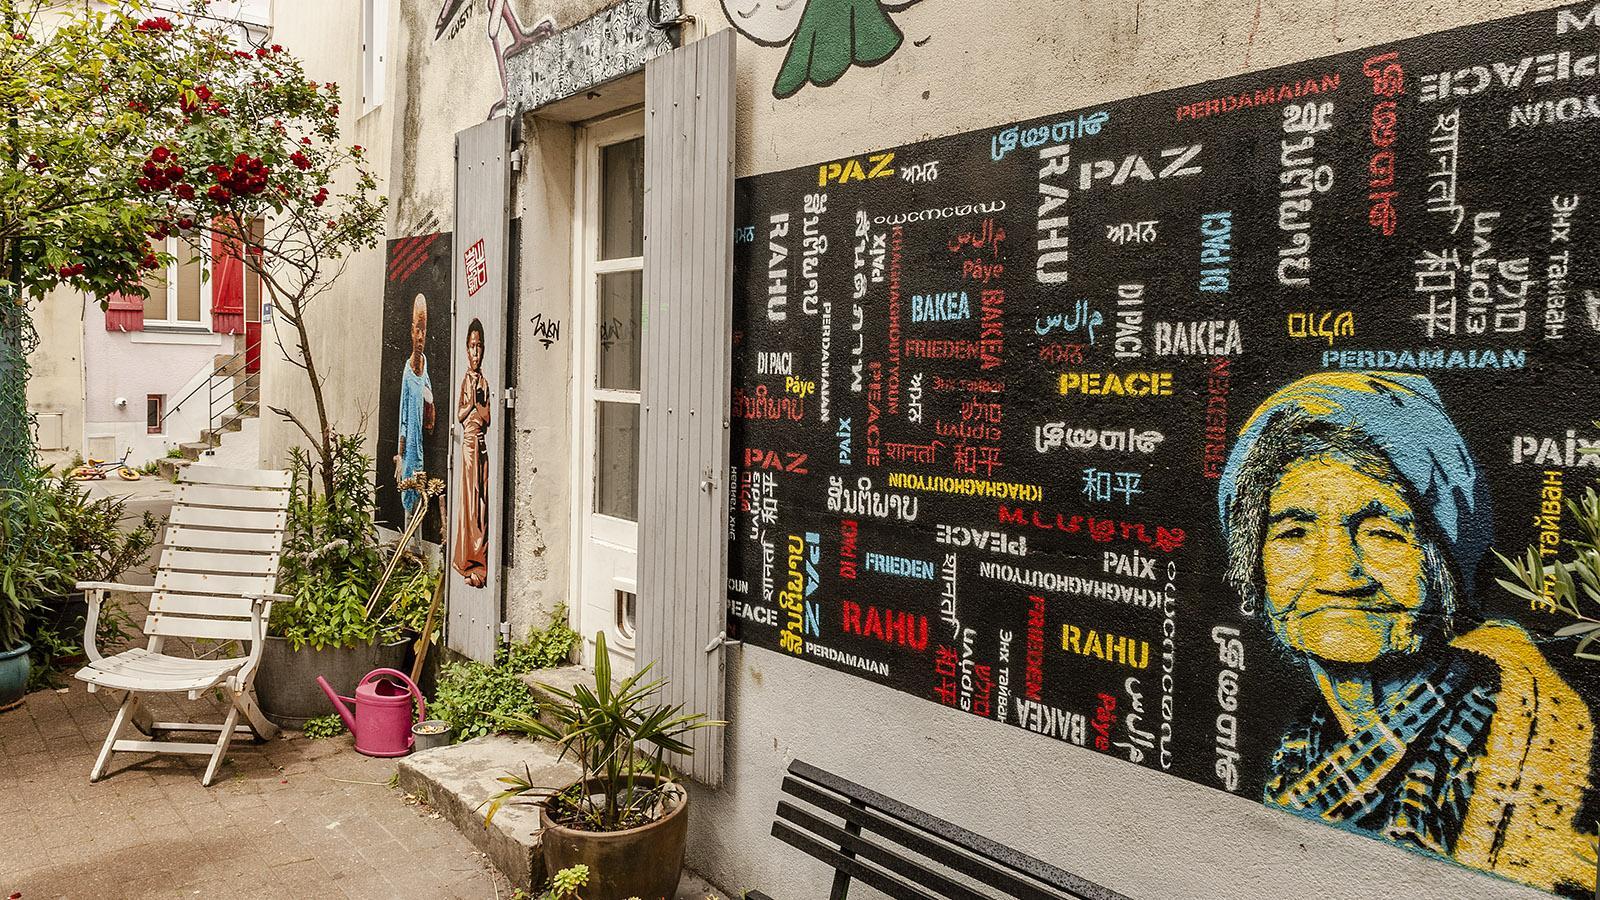 Nantes: Trentemoult. Frieden! fordert diese Street-Art in vielen Sprachen. Foto: Hilke Maunder